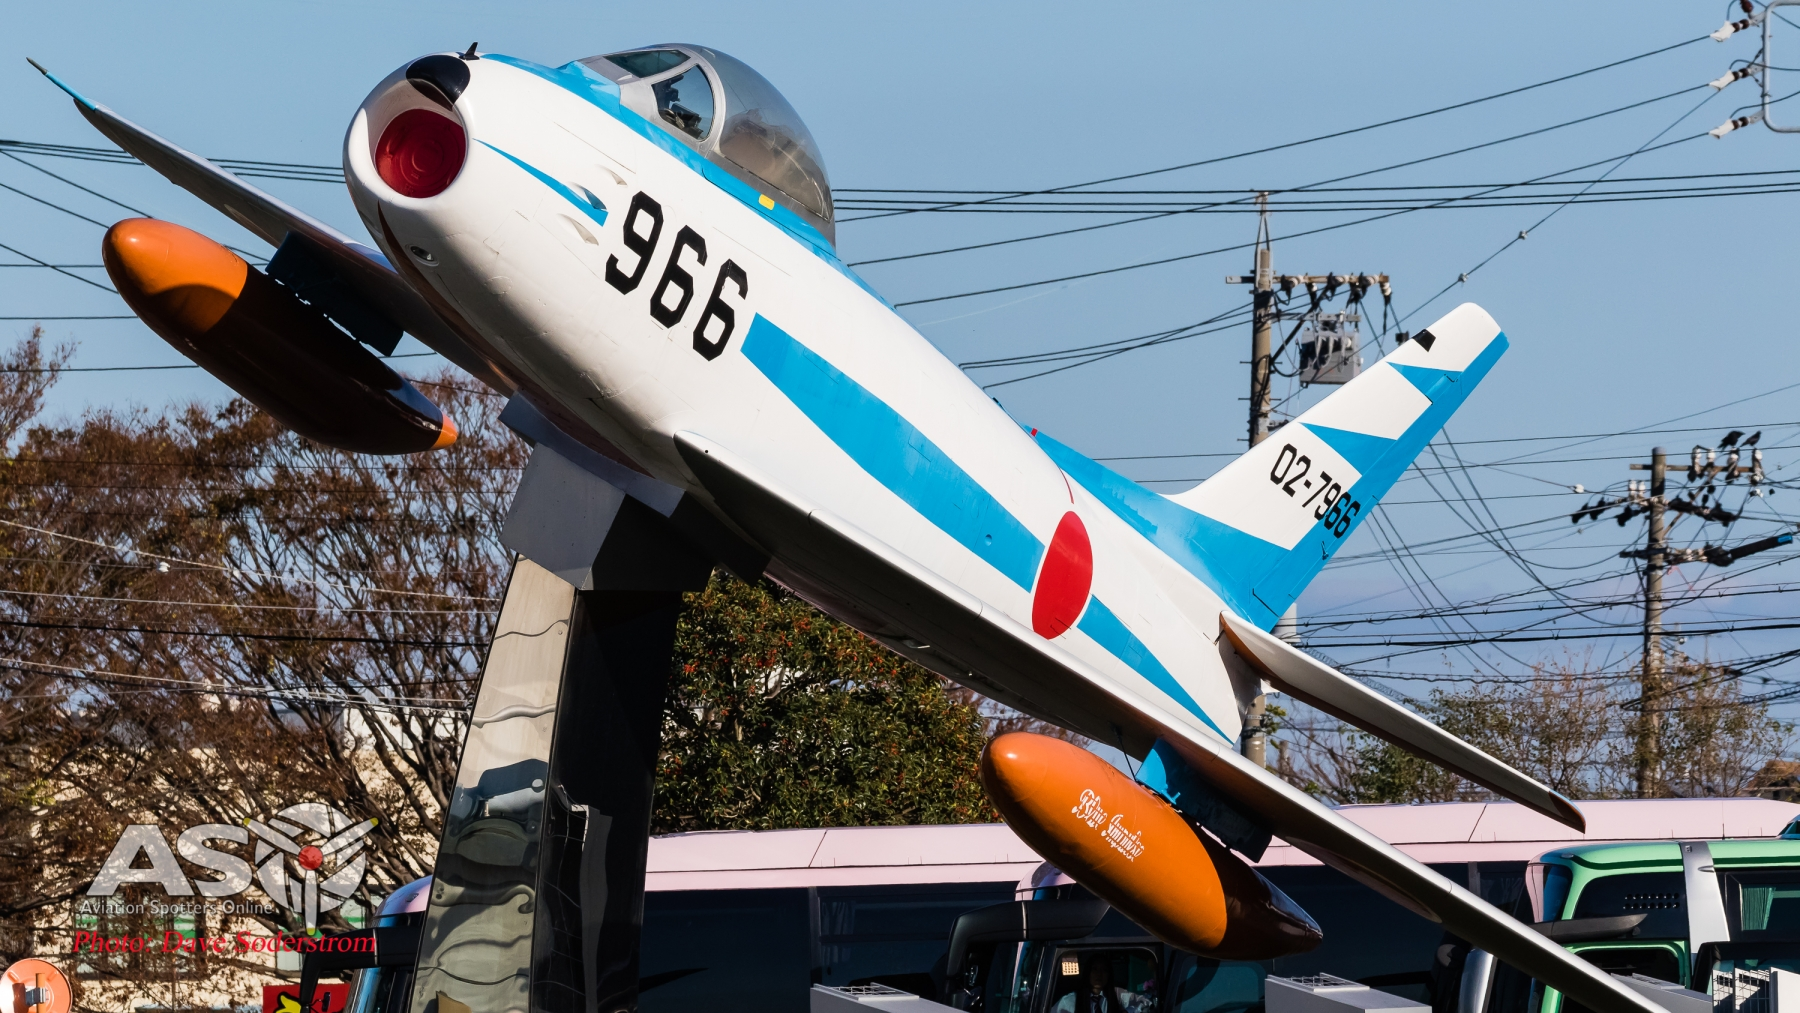 JASDF-Museum-2018-33-1-of-1